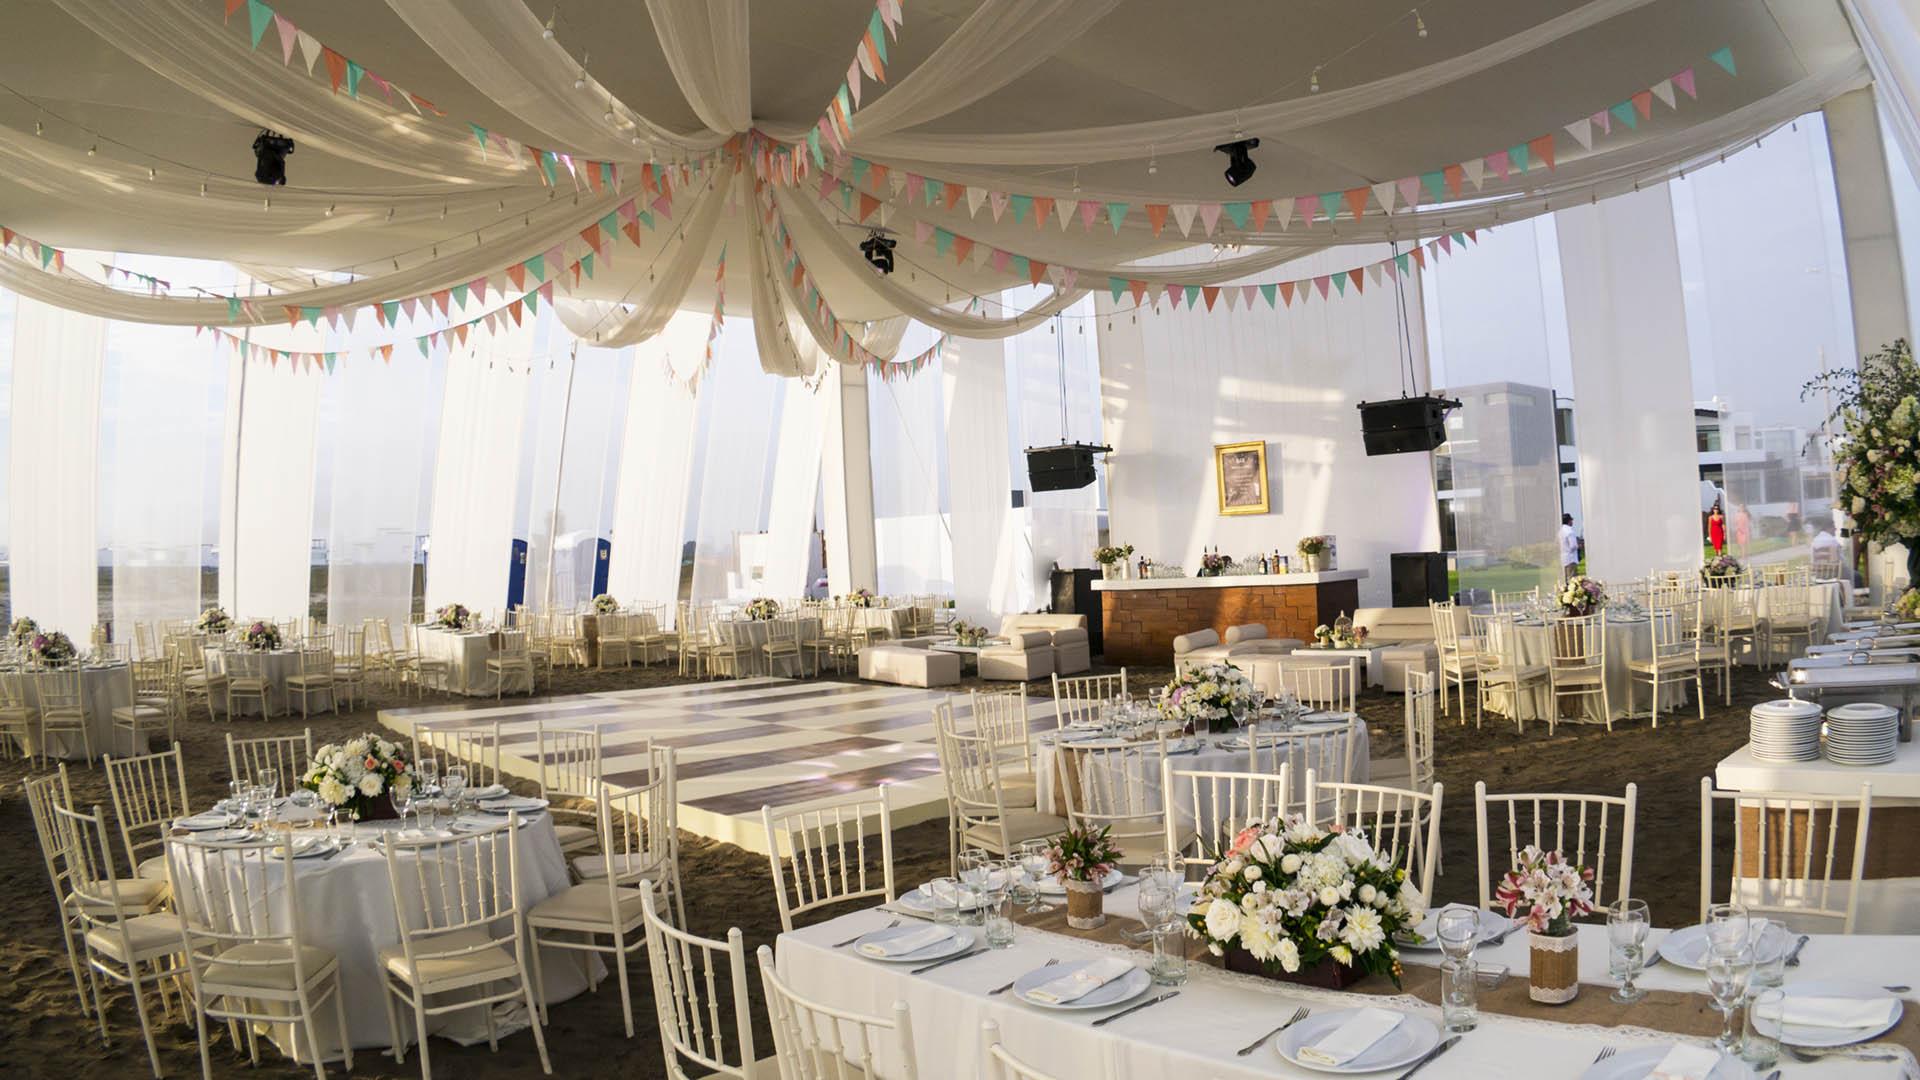 Organizaci n y catering para bodas matrimonios recepci nes lima per tzabar catering - Toldos para la playa ...